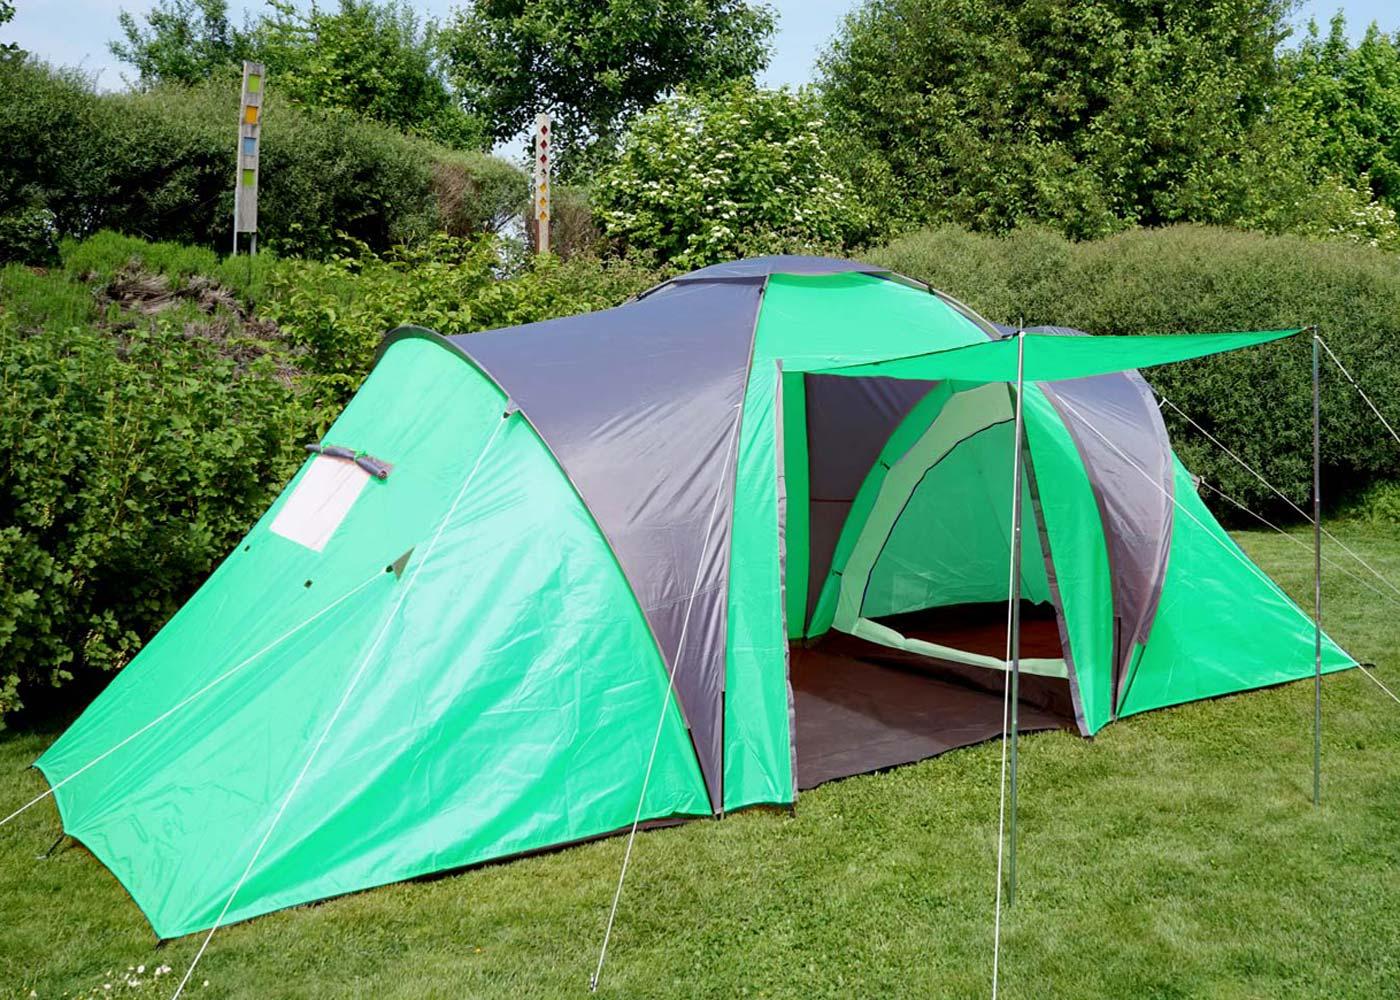 Zelt Mit Kamin : Campingzelt loksa mann zelt kuppelzelt igluzelt